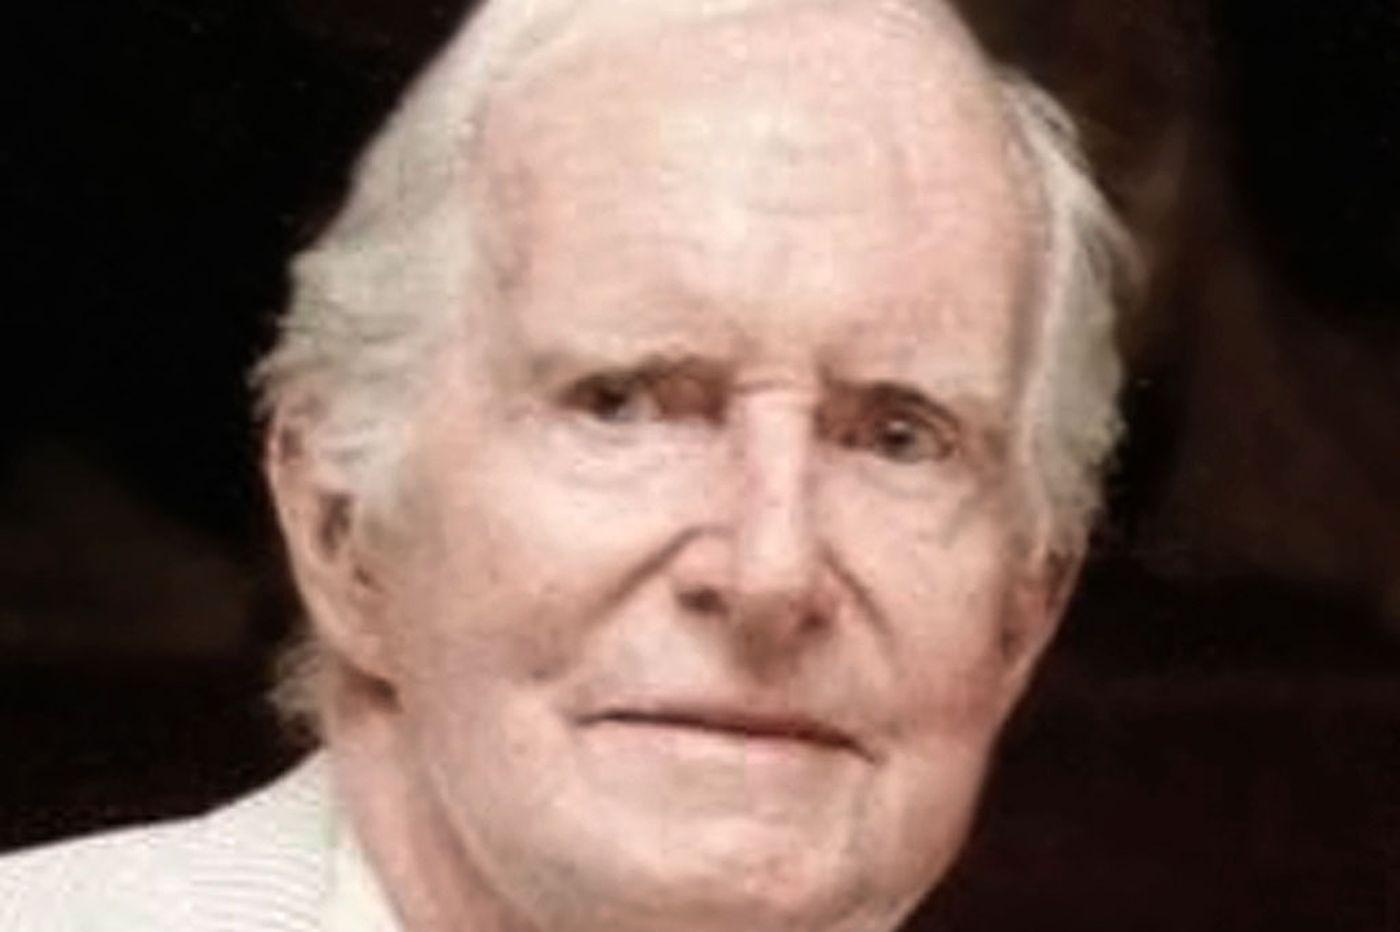 John McDougall, 82, public defender